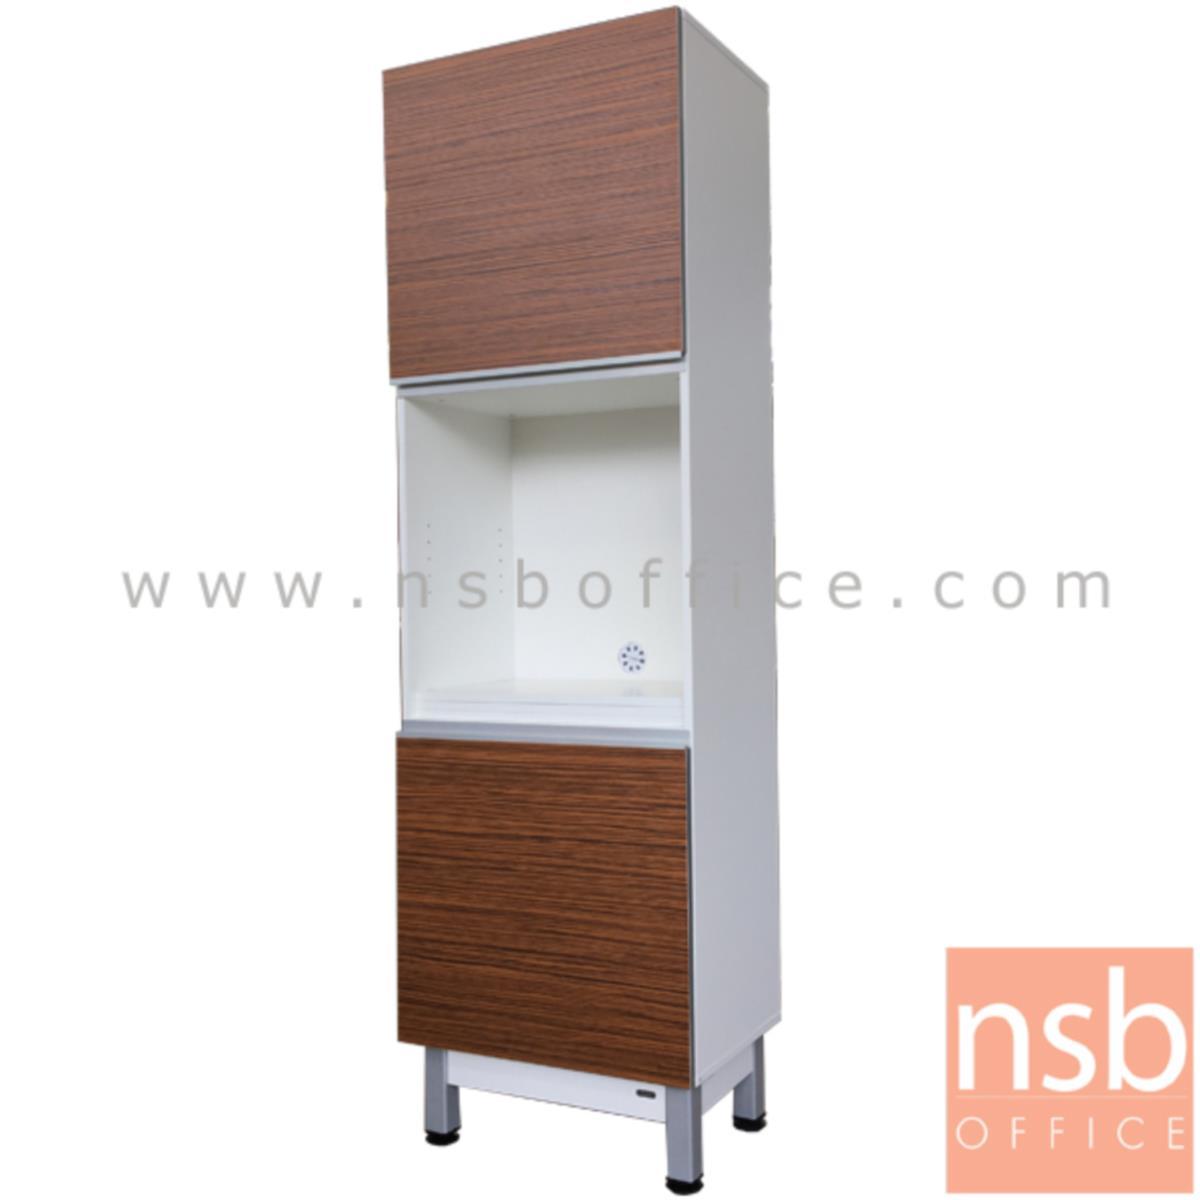 K04A007:ตู้ครัวสีลายไม้ตัดขาวสูงบน-ล่าง 1 บานเปิด รุ่น Martinell 7 มีช่องโล่งตรงกลาง (สำหรับครัวเปียกและครัวแห้ง)